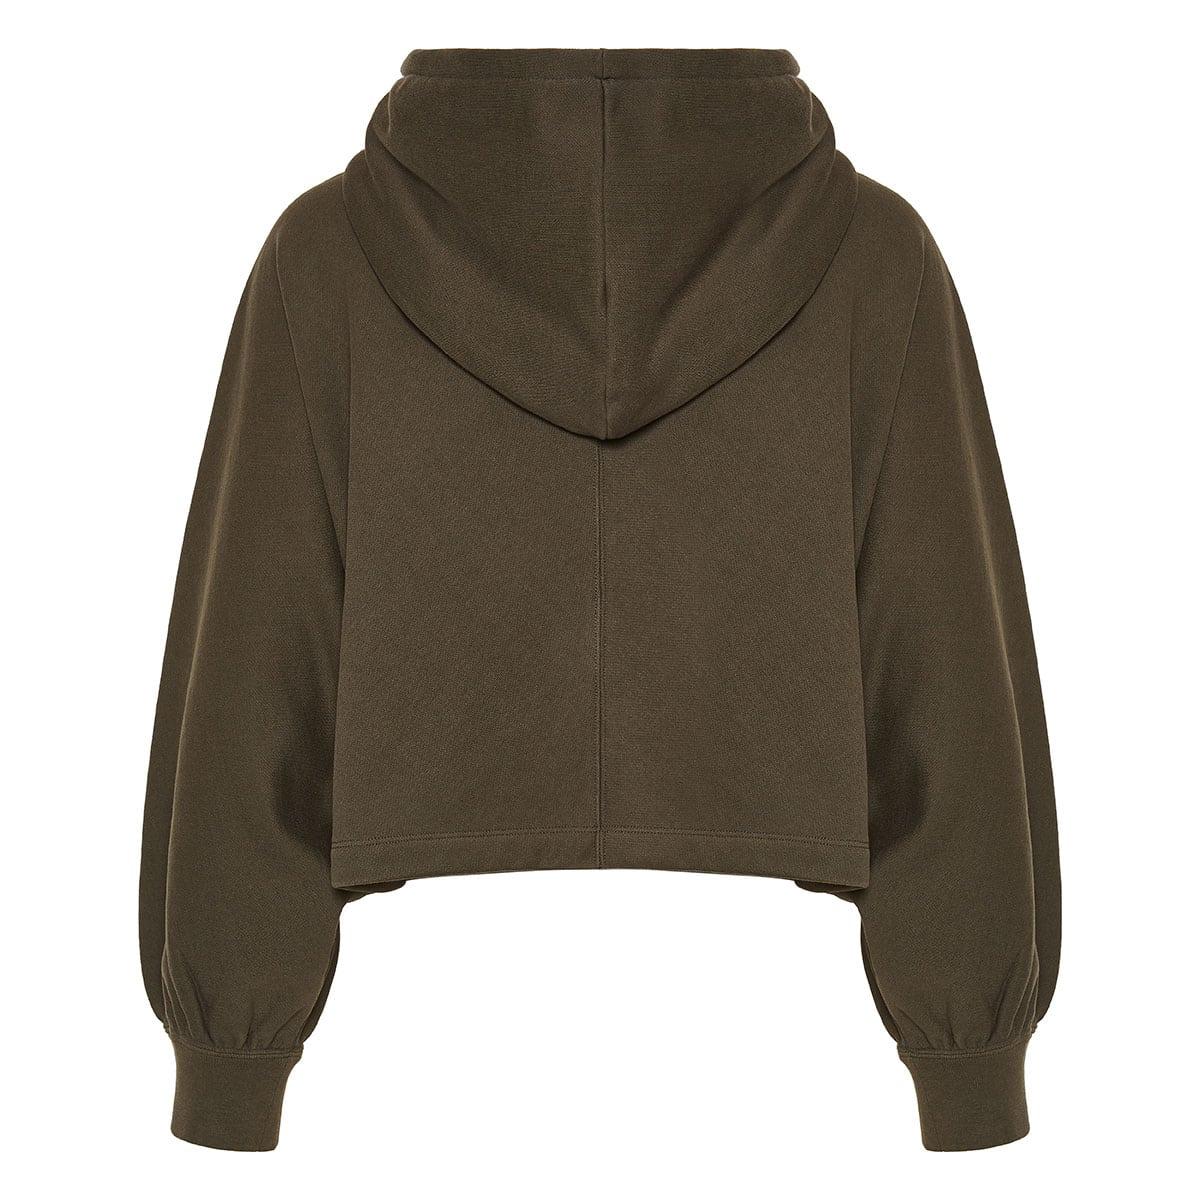 Vlogo cropped zipper hoodie